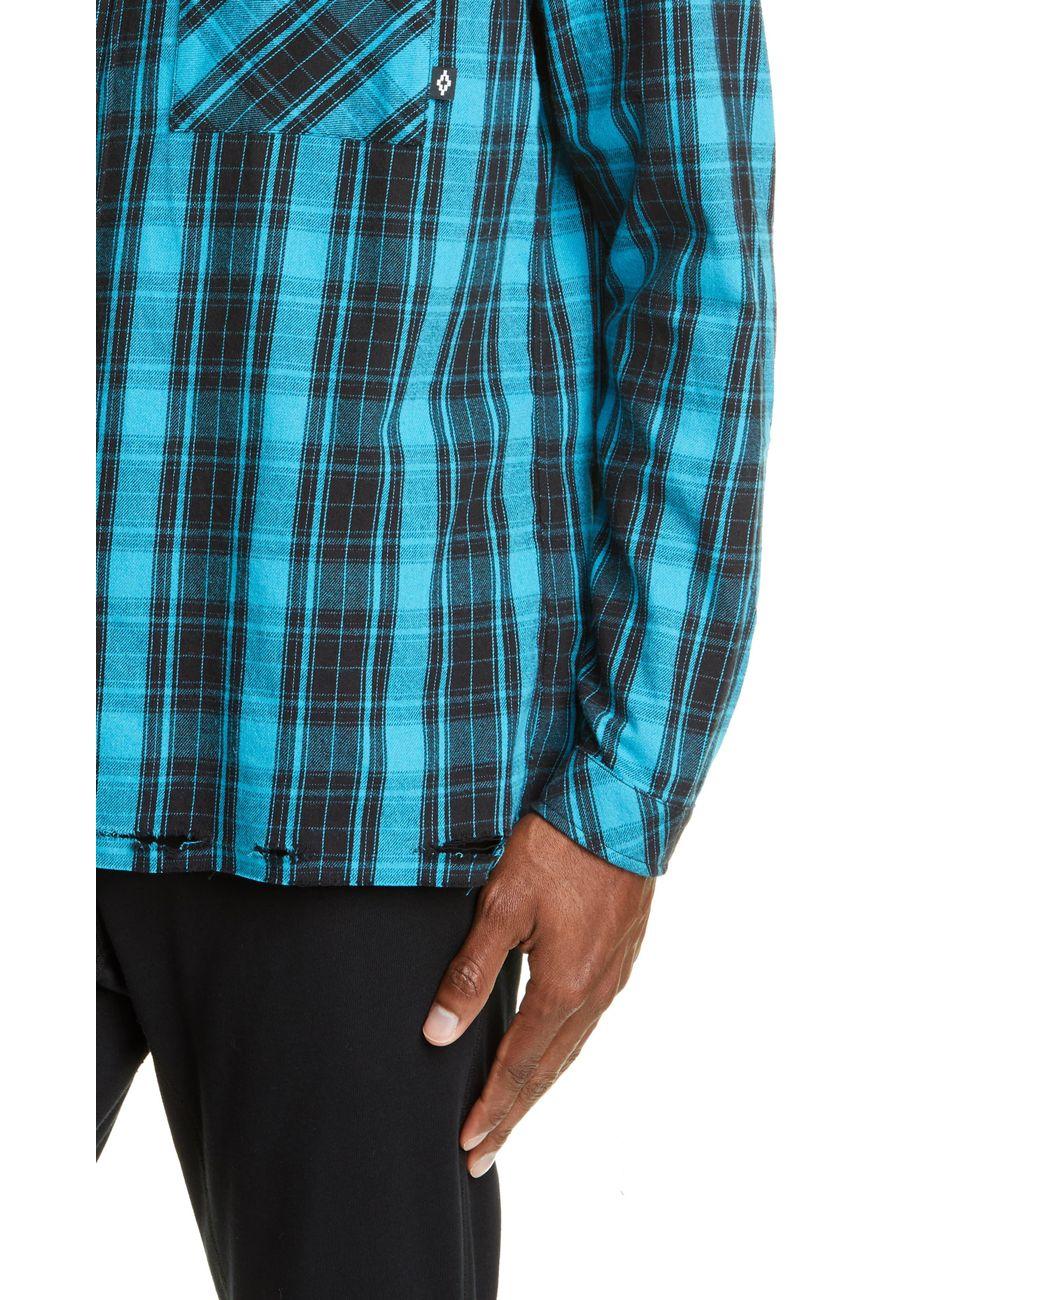 358d8a3e5322 Marcelo Burlon County Check Plaid Button-up Flannel Shirt in Blue for Men -  Lyst